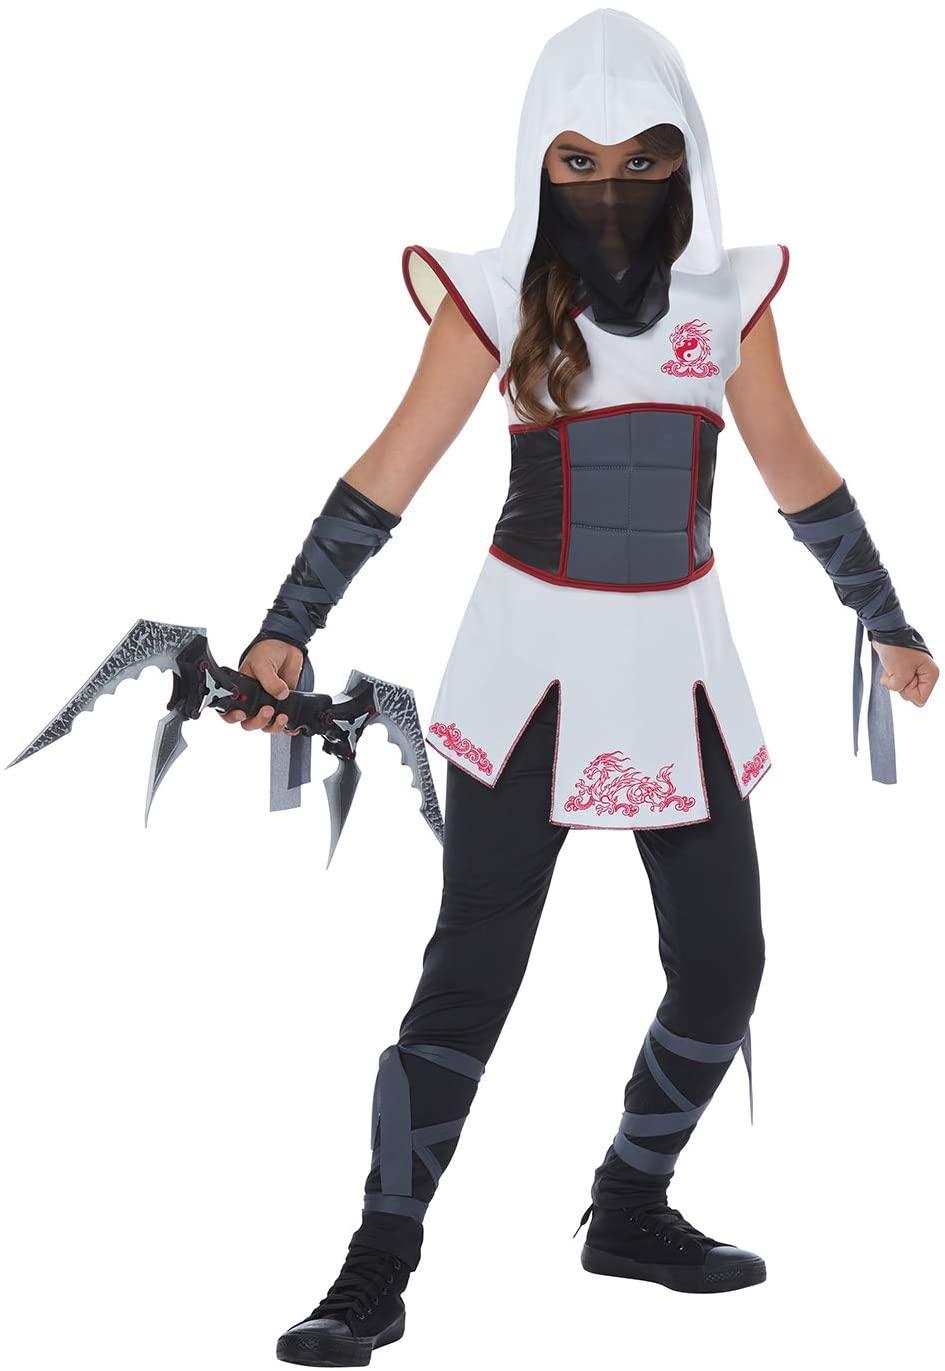 Fearless Ninja Girls Costume